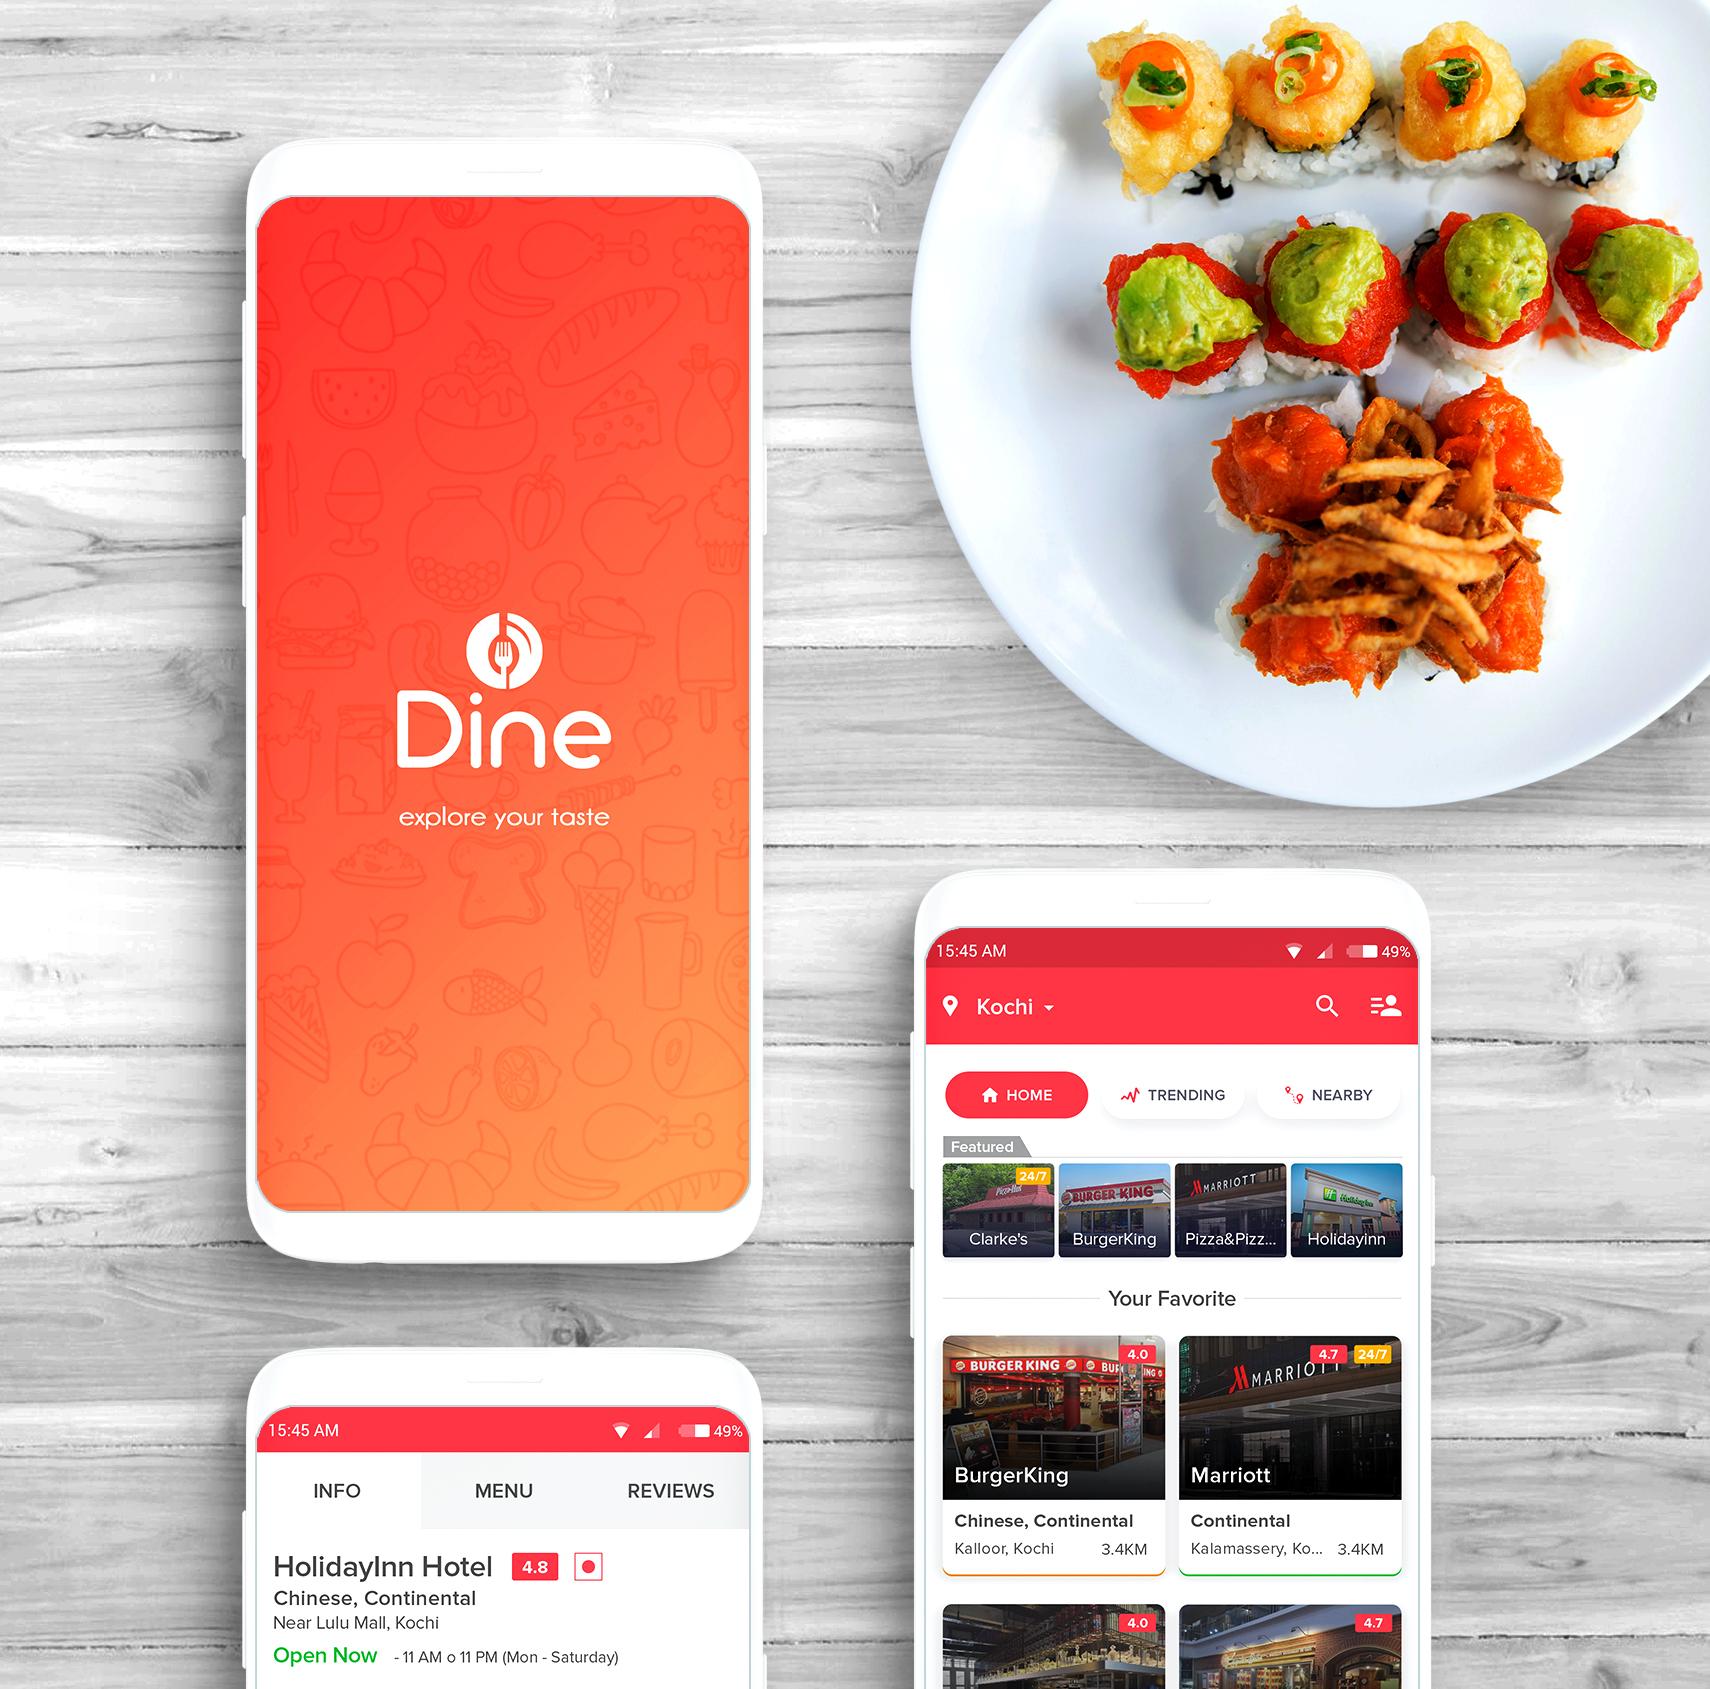 Near Dine